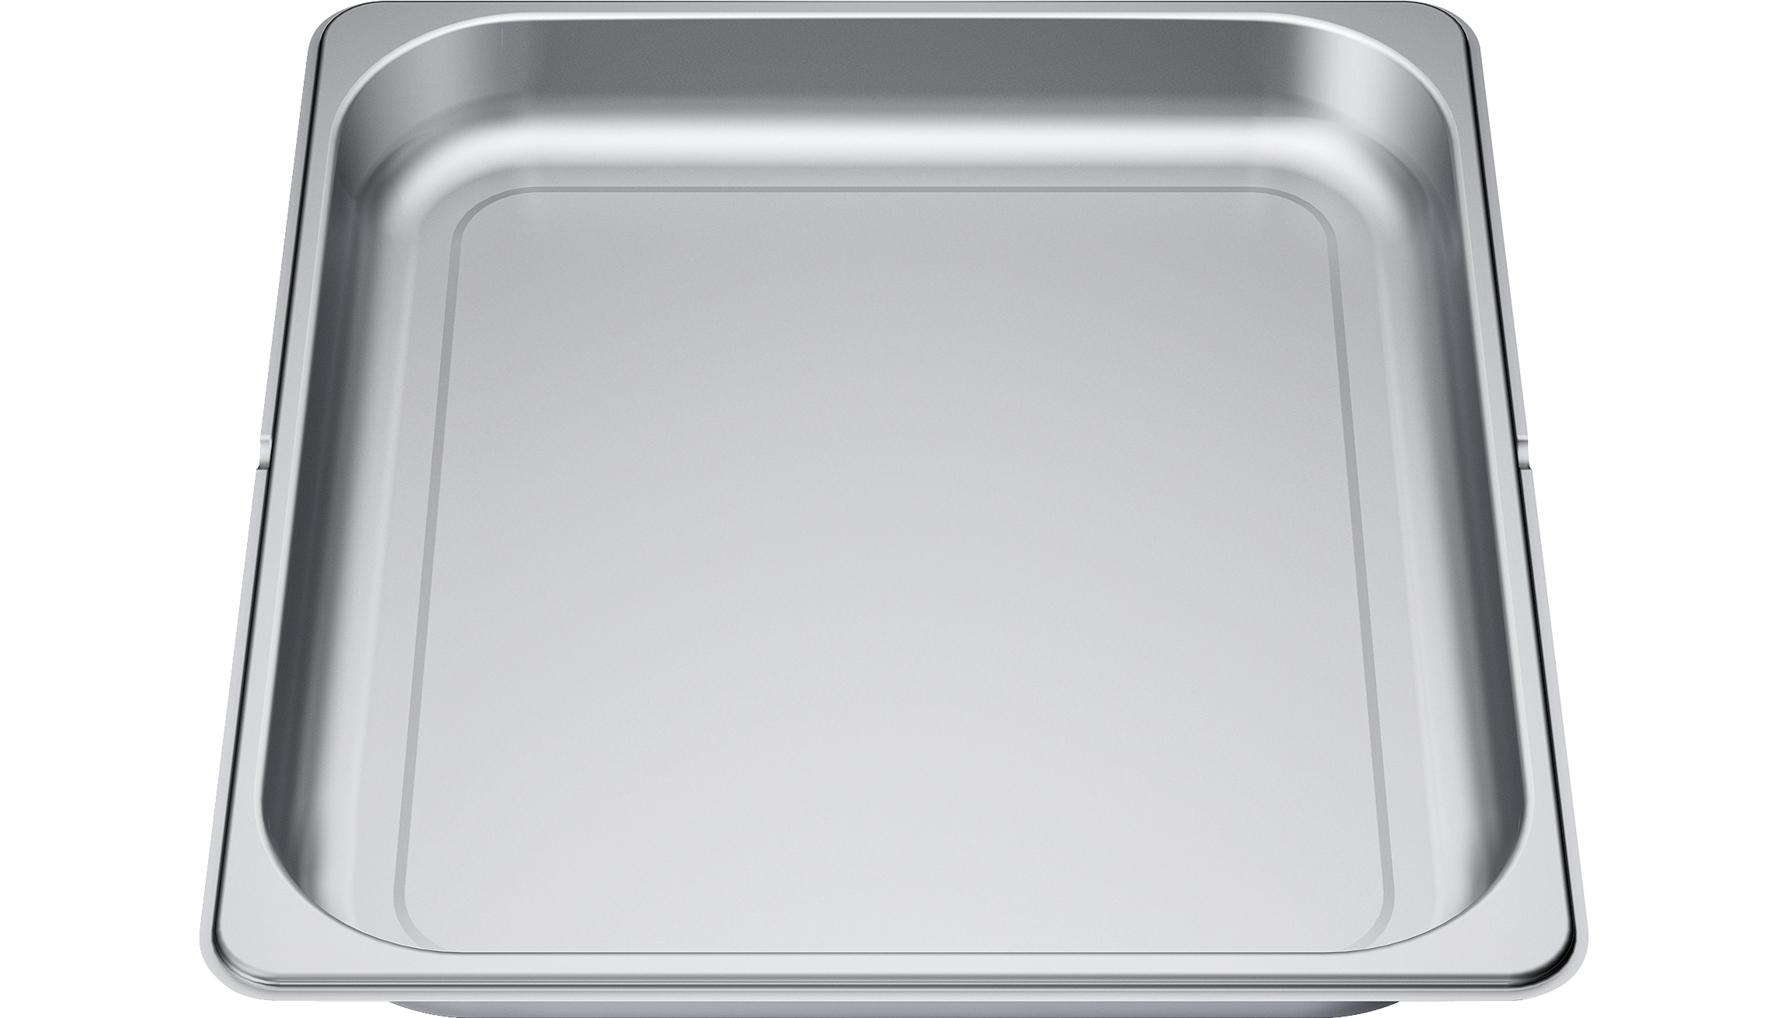 neff produkte dampfgarer fullsteam dampfgarer und backofen in einem ger t z13cu40x0. Black Bedroom Furniture Sets. Home Design Ideas